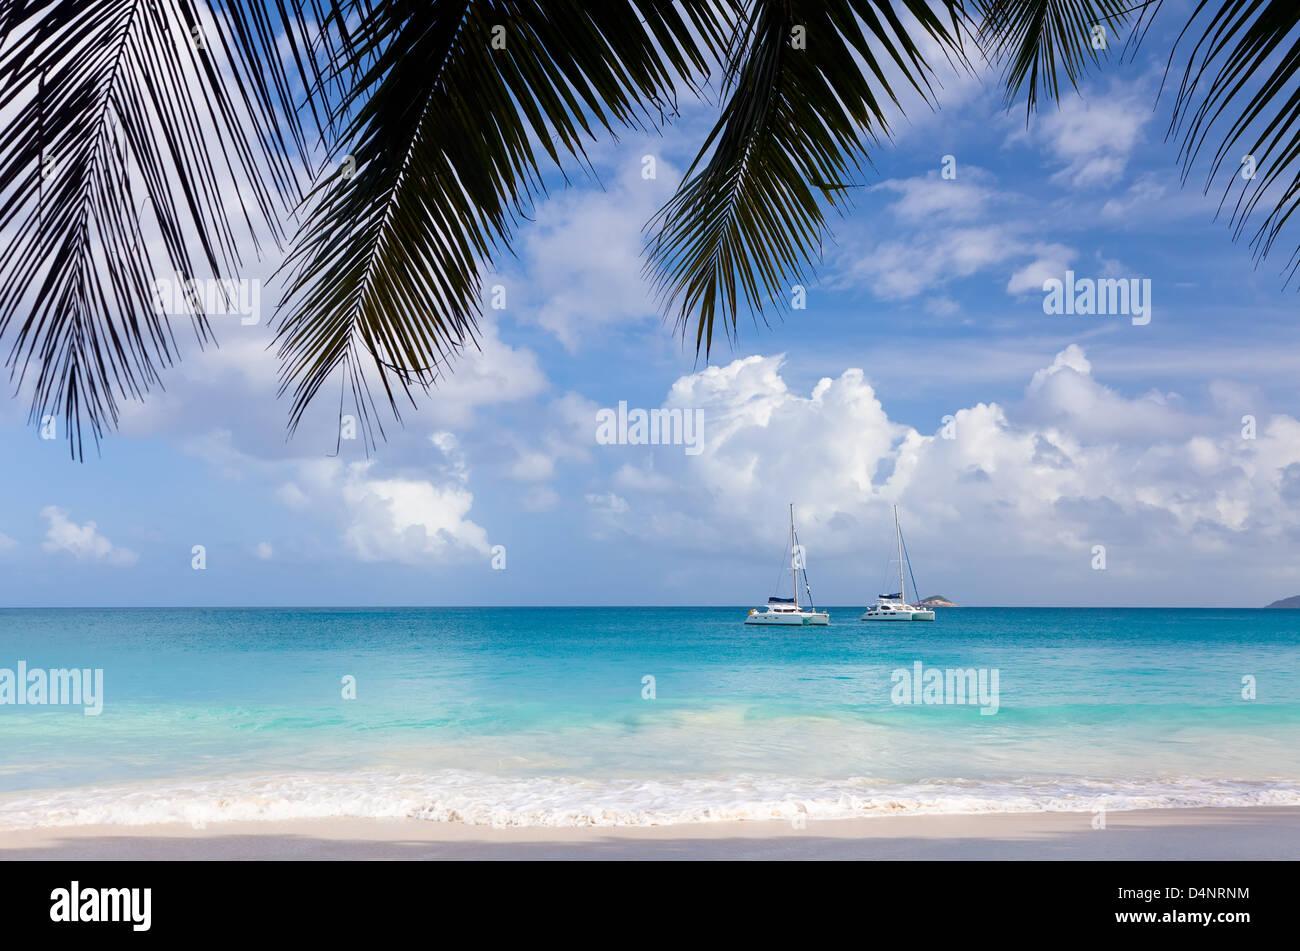 Tropical beach Anse Lazio, Seychelles - Stock Image